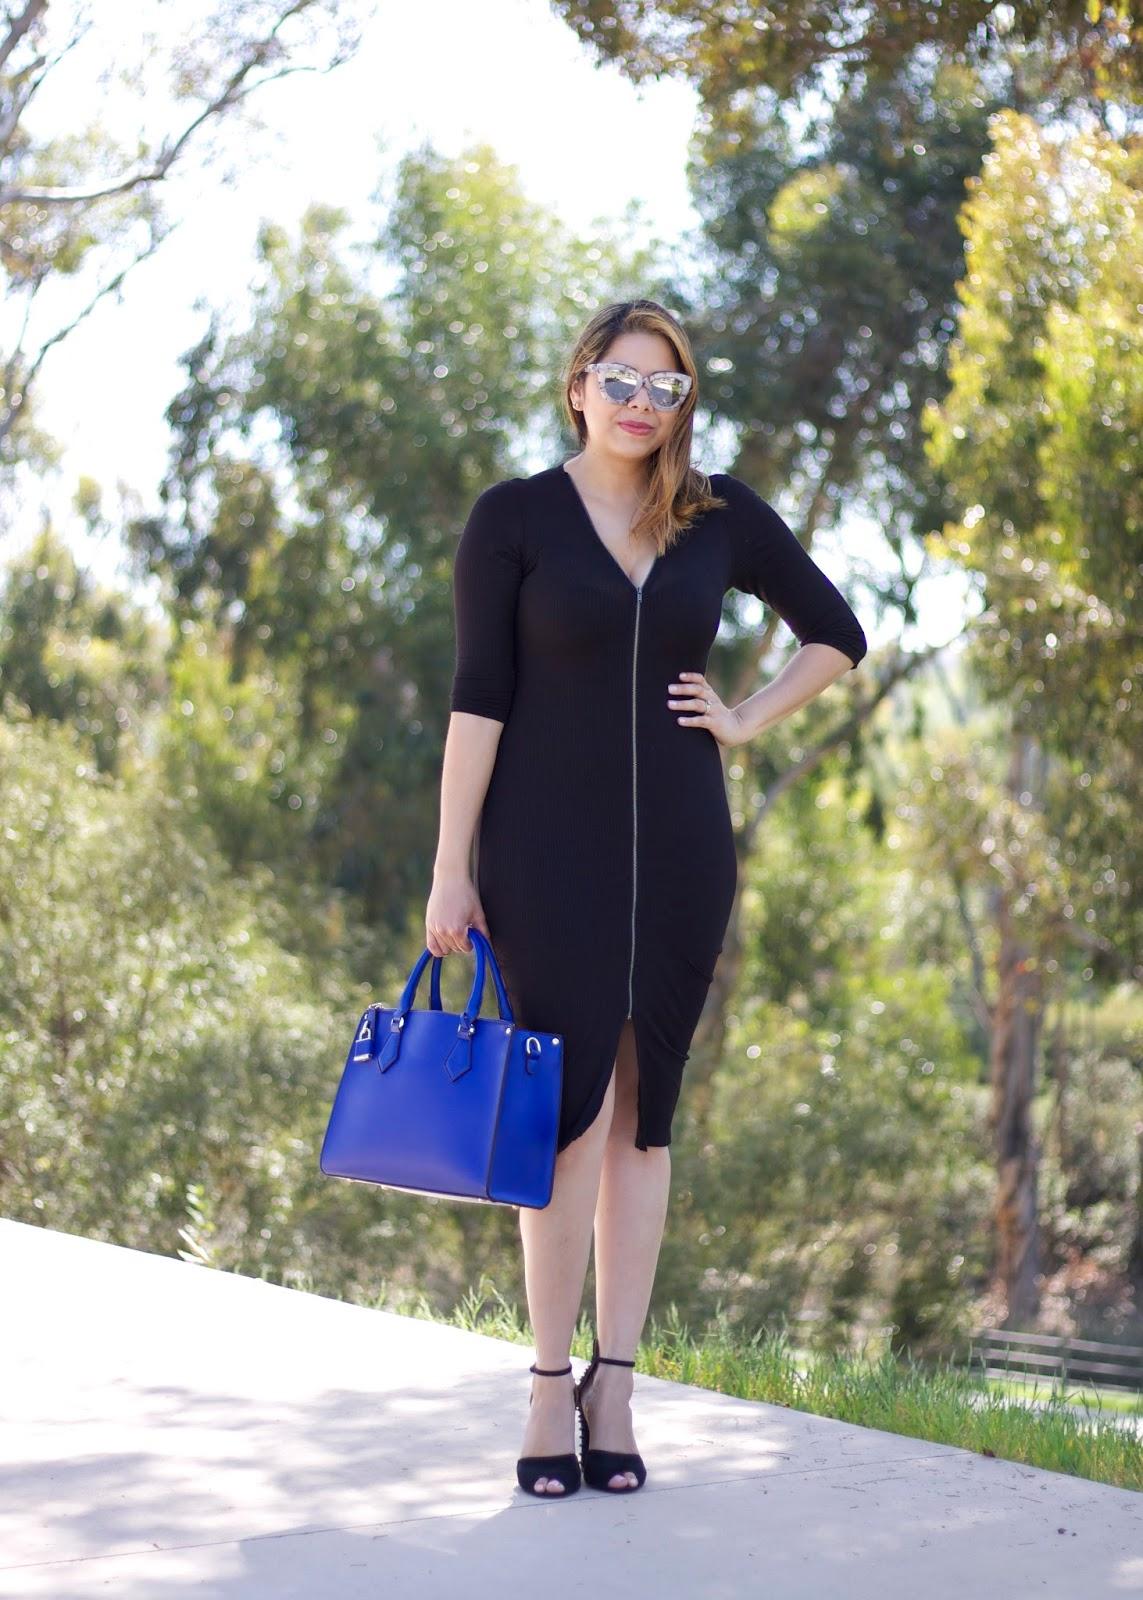 QUay sunnies, quay blogger, black and blue outfit, zara shoes